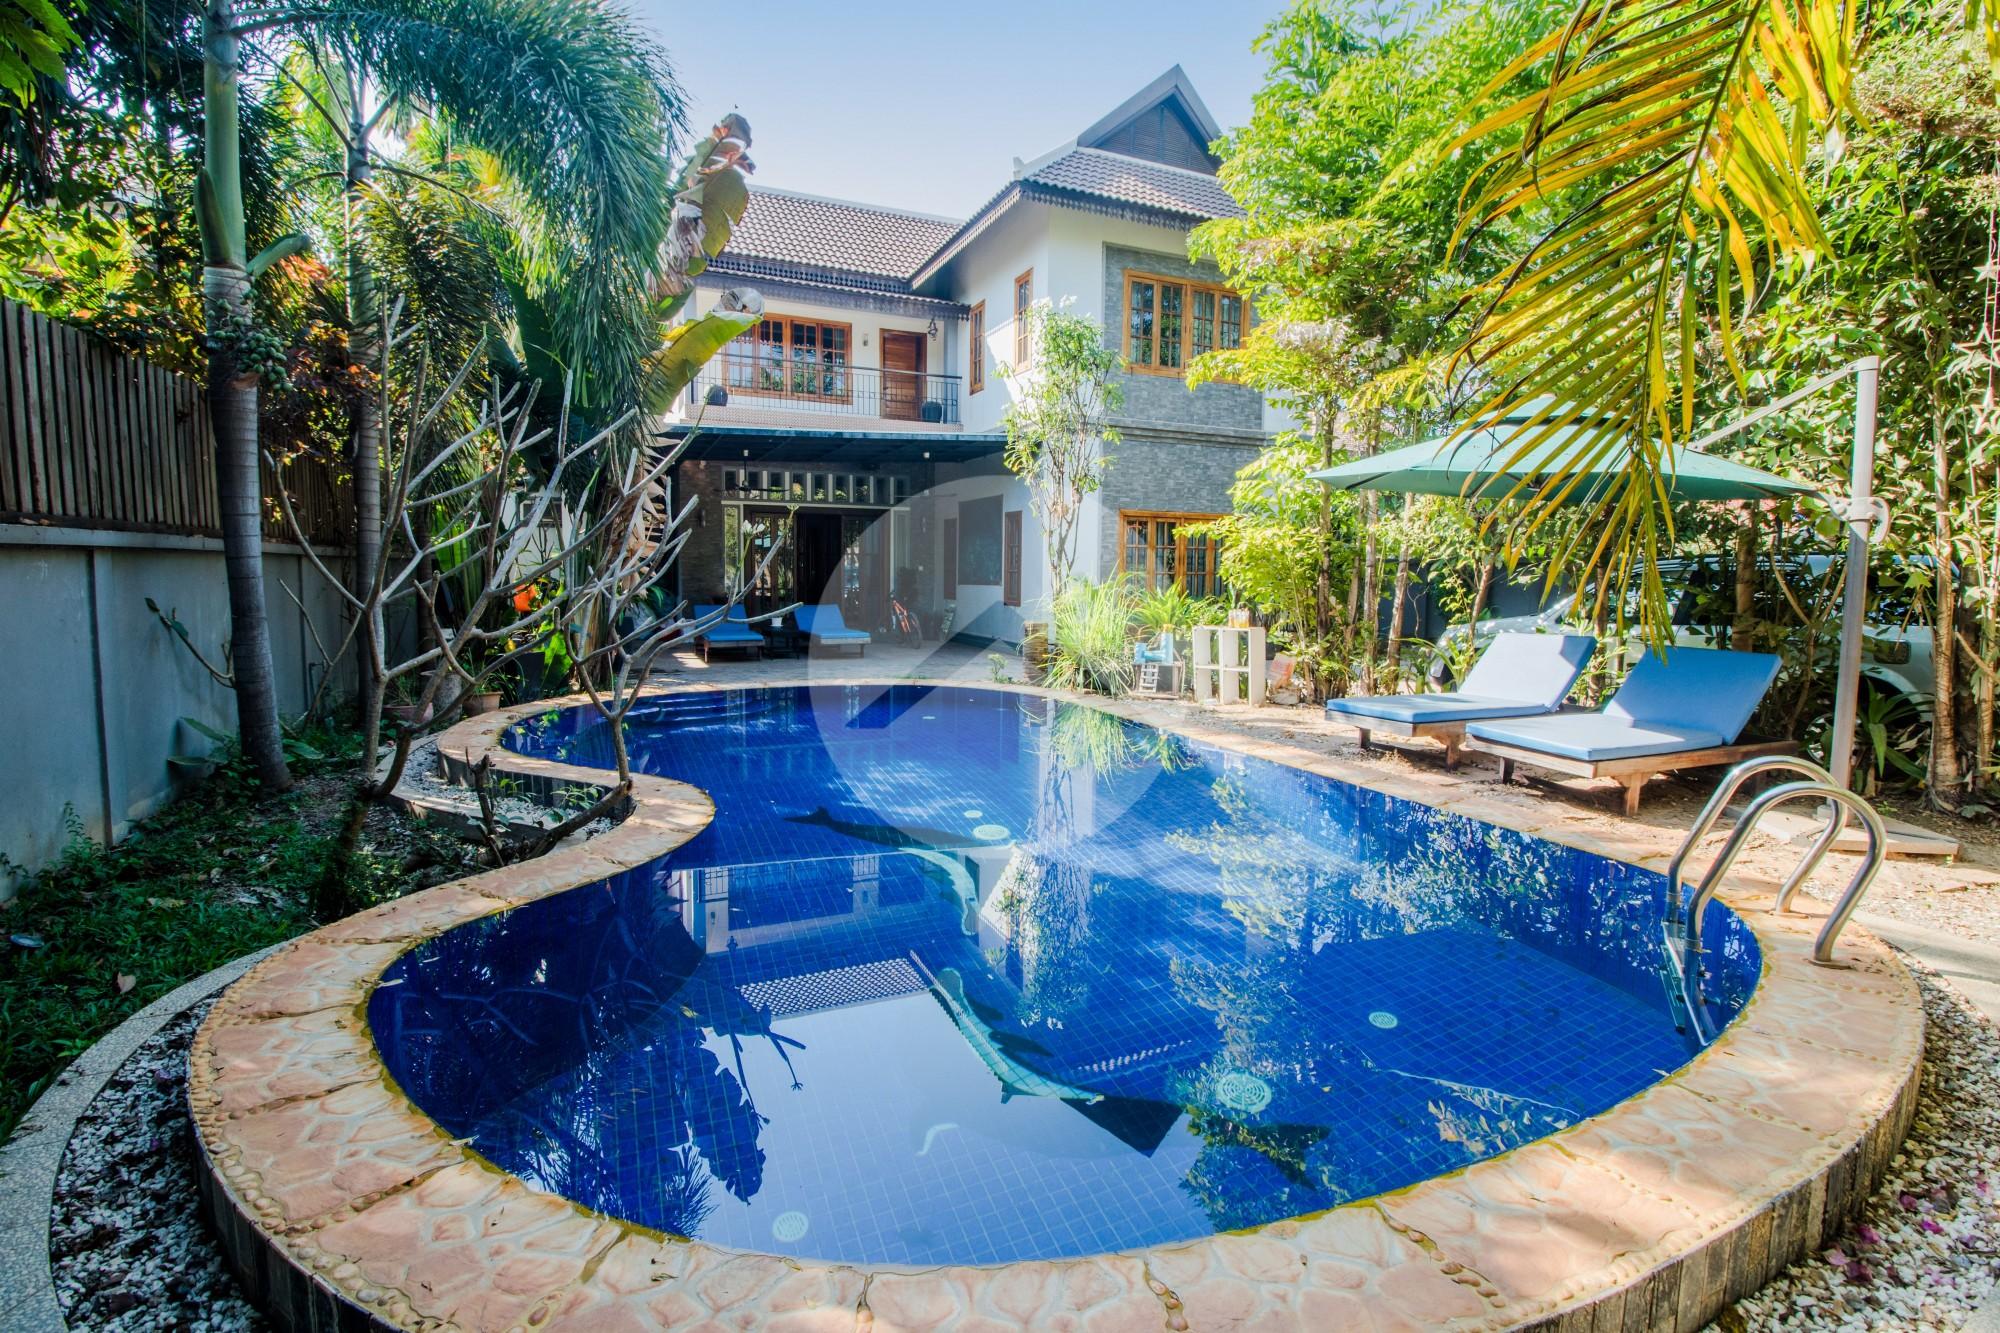 5 Bedroom Villa for Sale - Tropeng Traeng, Siem Reap